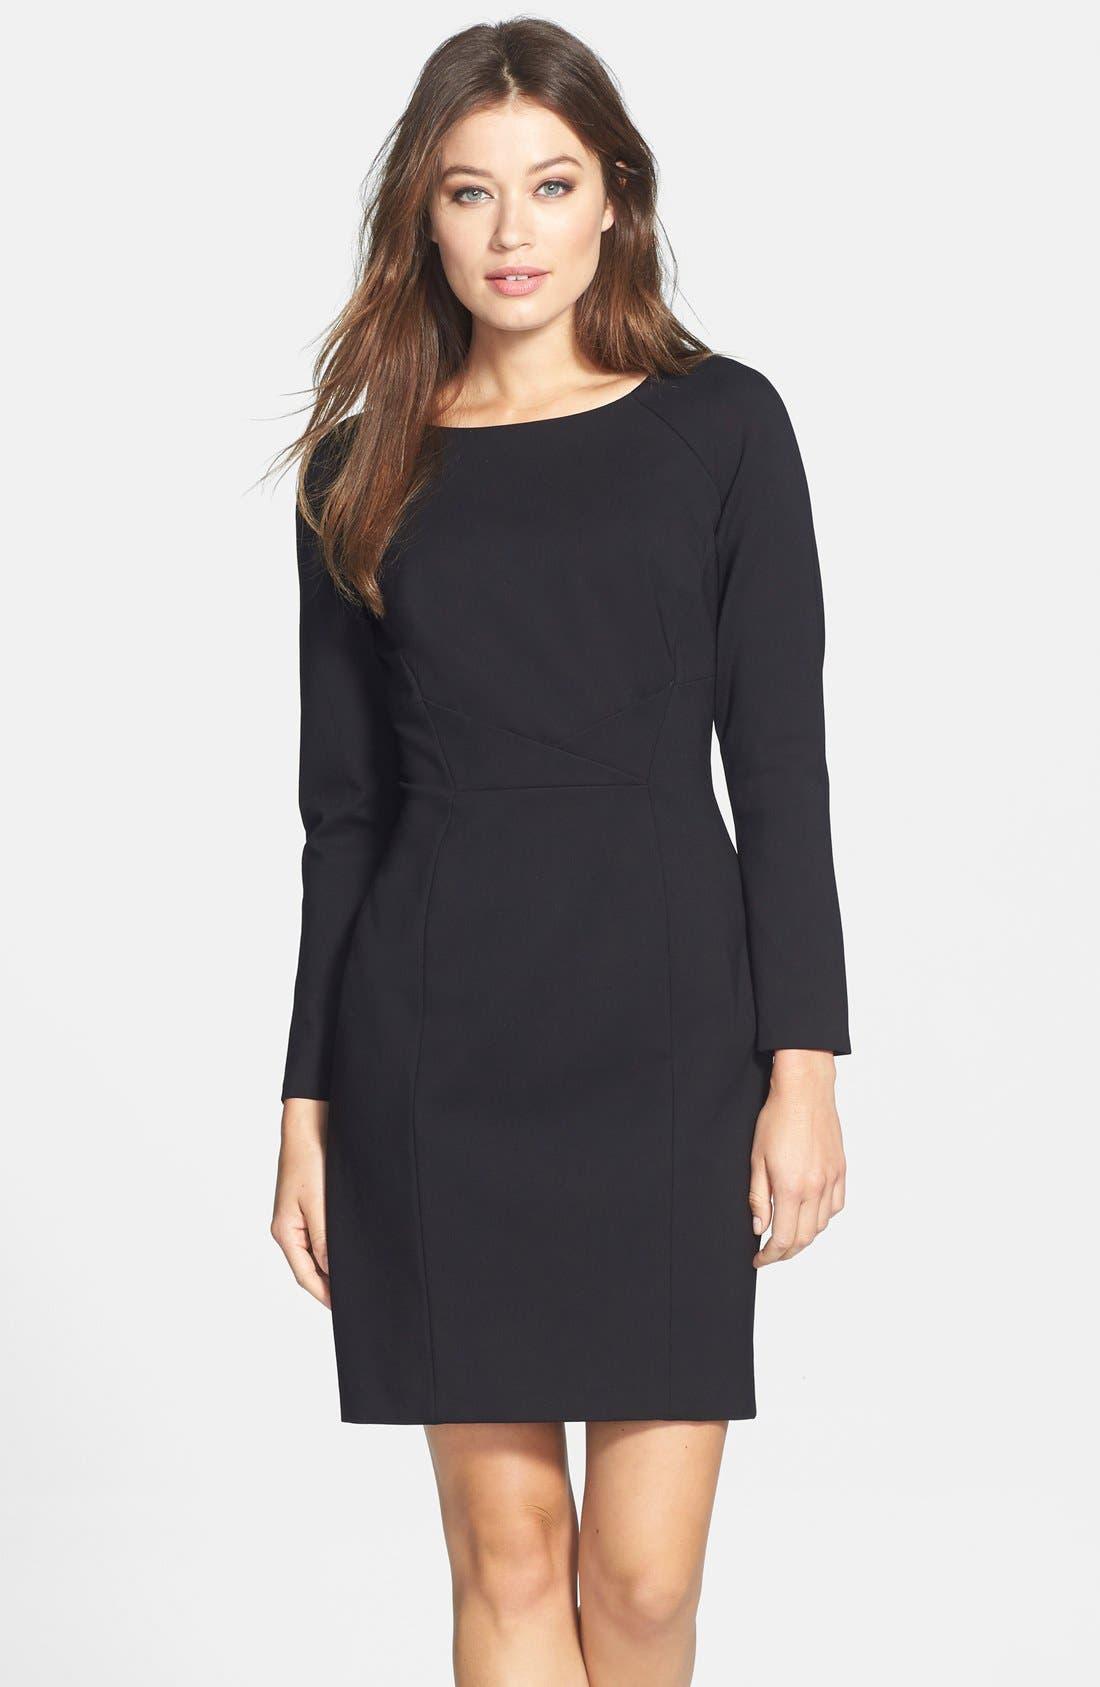 TAHARI Pleat Detail Long Sleeve Ponte Sheath Dress, Main, color, 001